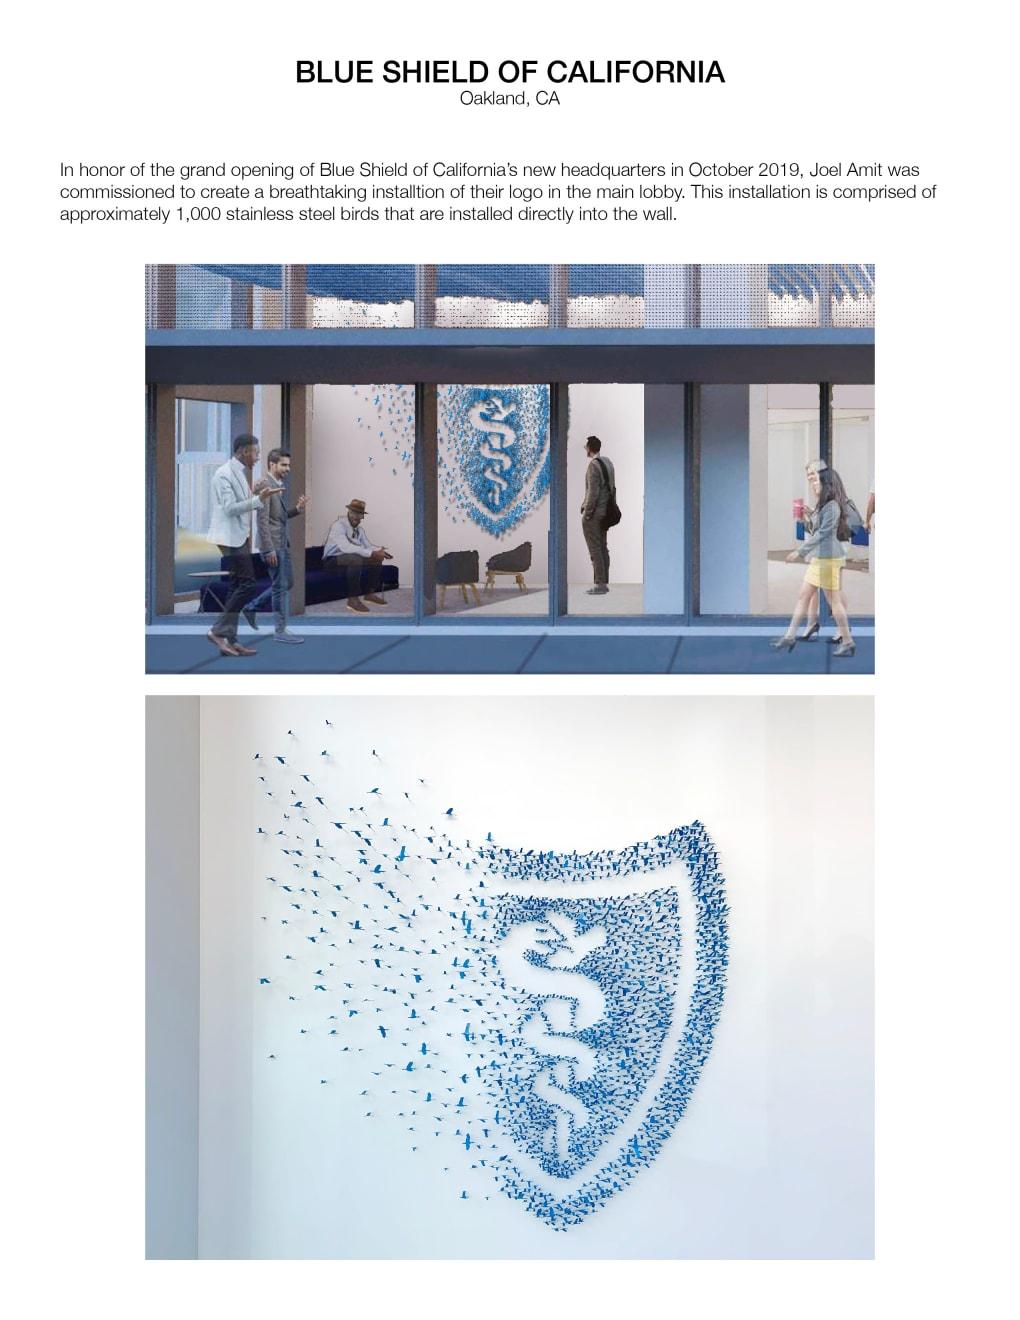 Corporate Commission Blue Shield of California Oakland, Ca